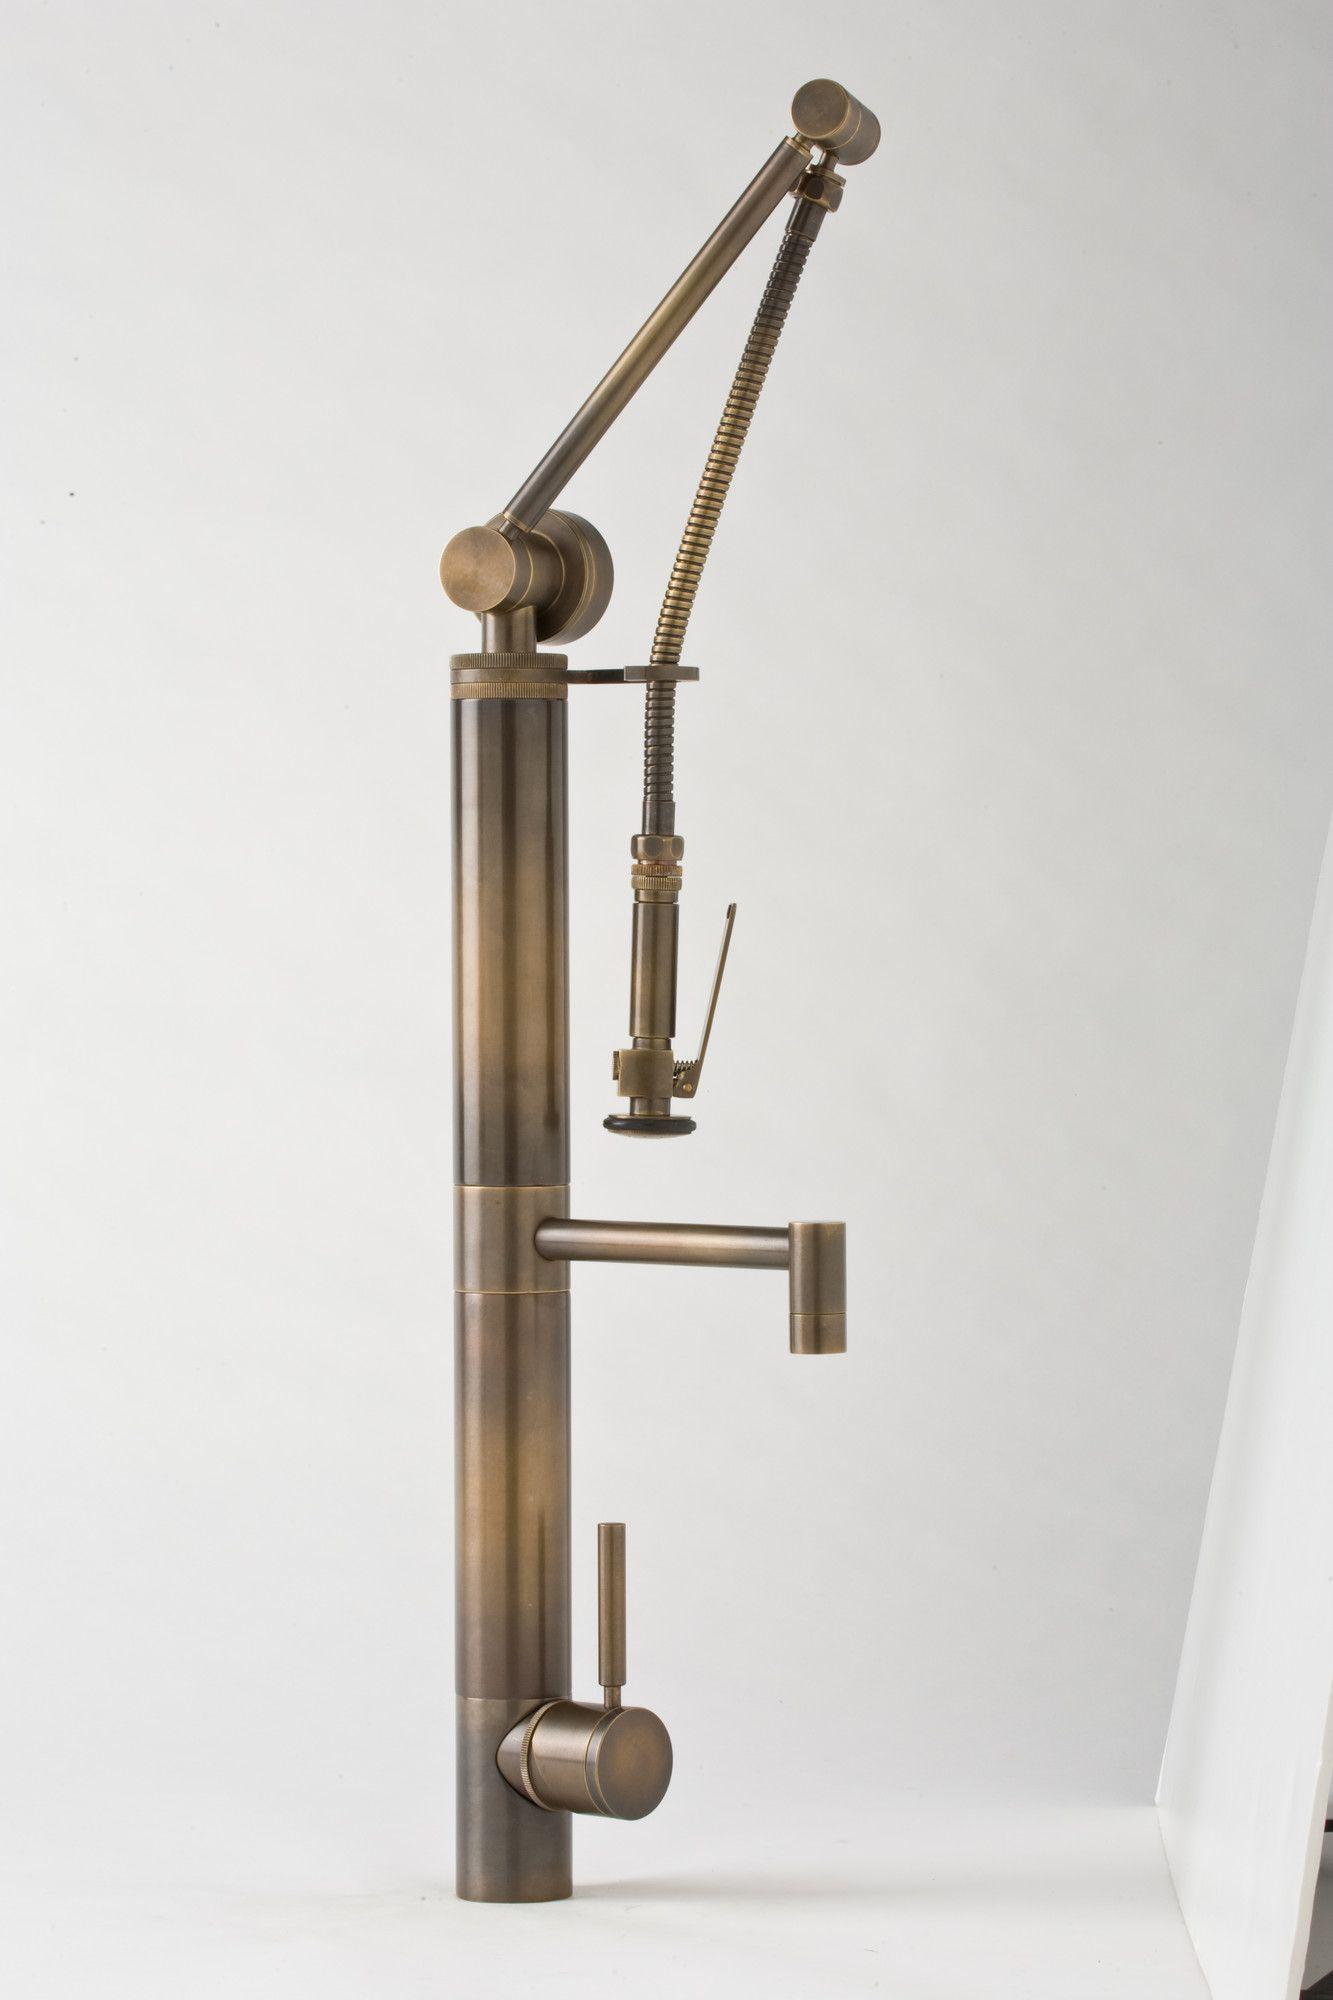 Waterstone Hunley Gantry Single Handle Single Hole Bar Faucet with Pre-Rinse Spray | AllModern